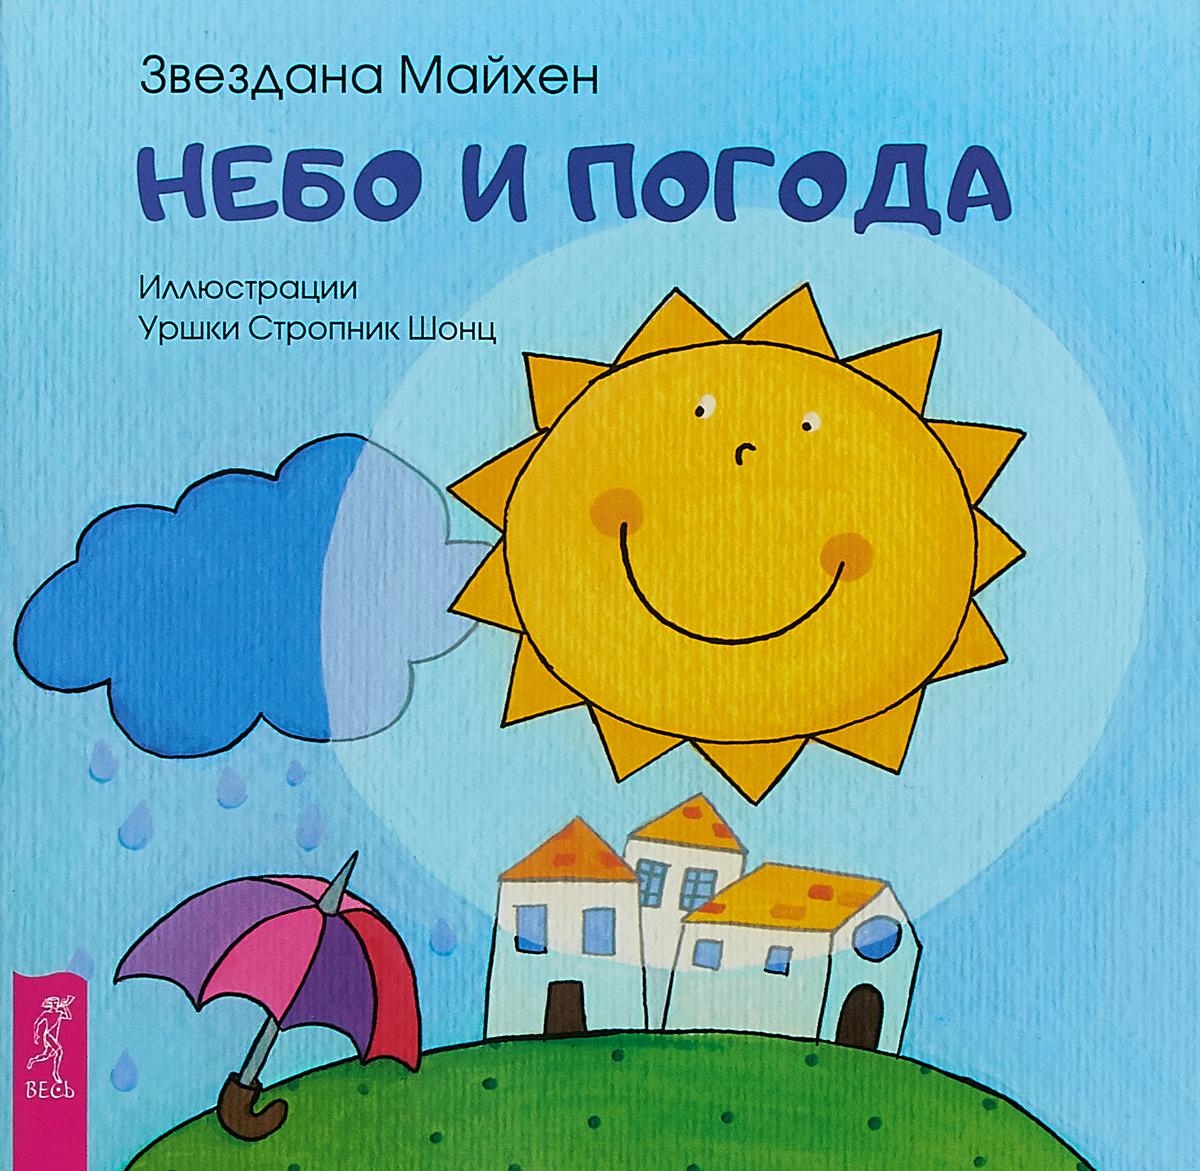 Майхен Звездана Небо и погода (3356)